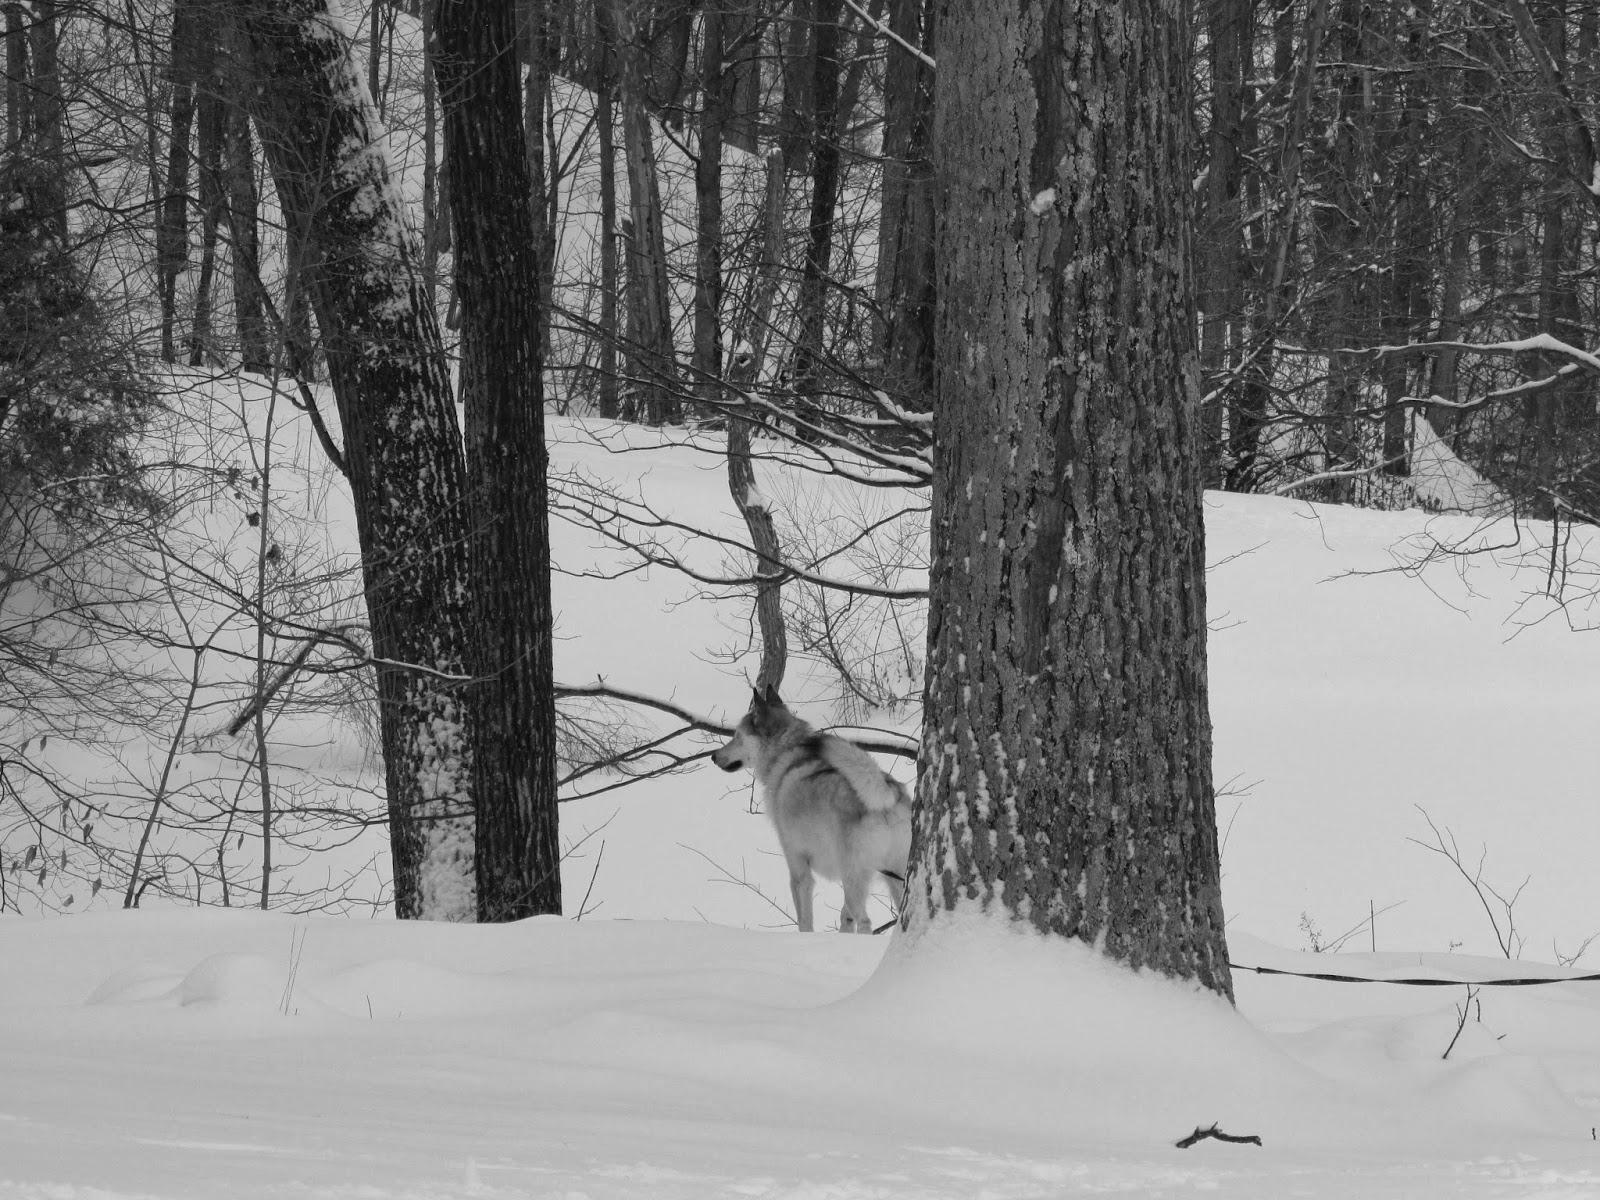 wolfdog, wolf hybrid